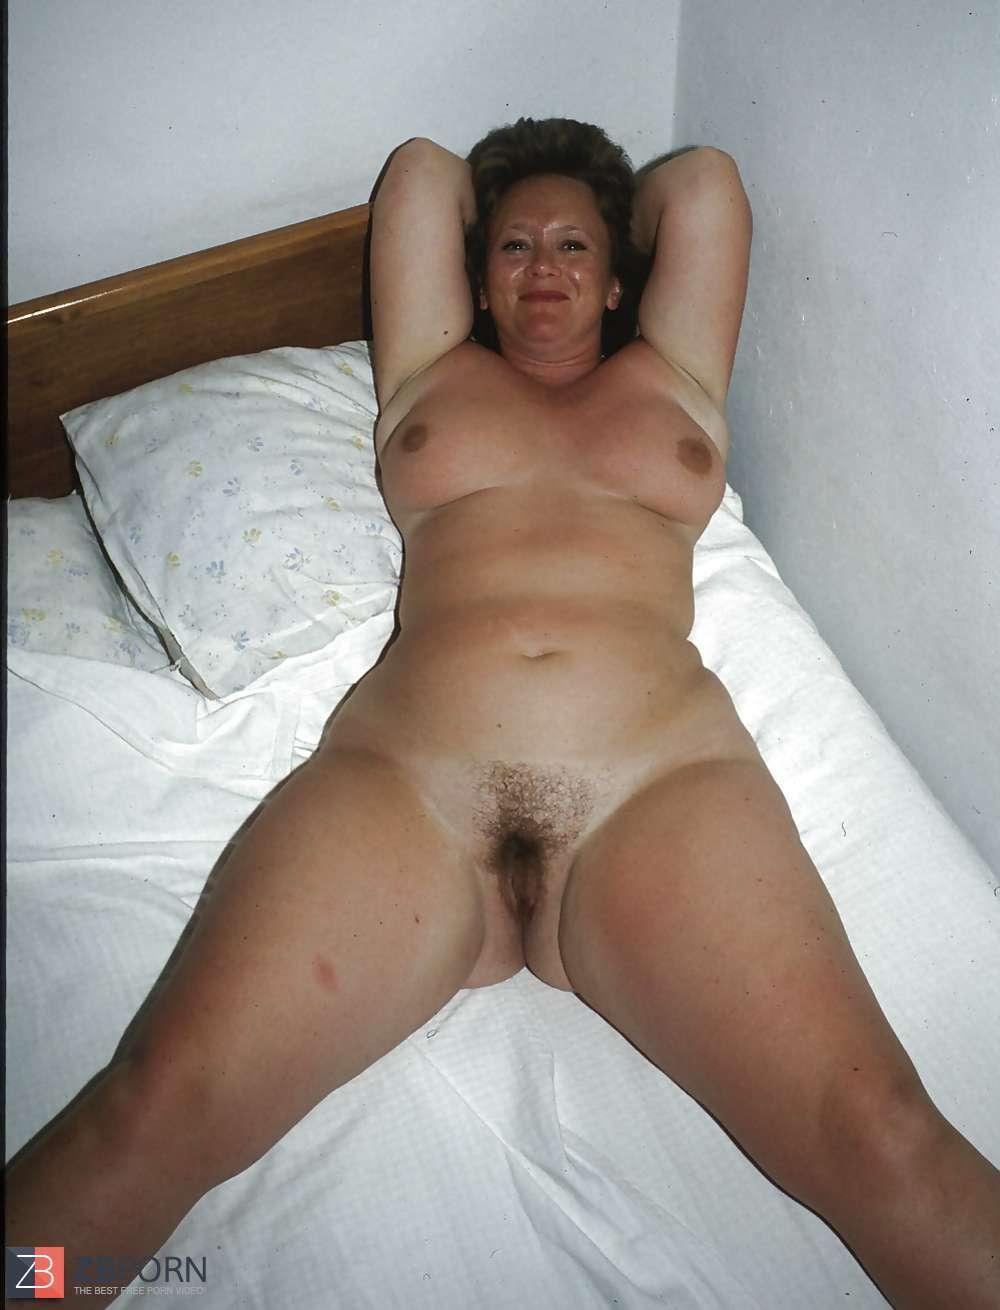 Amateur Mature Mom Porn mature mom nextdoor adult gallery comments 5   free hot nude